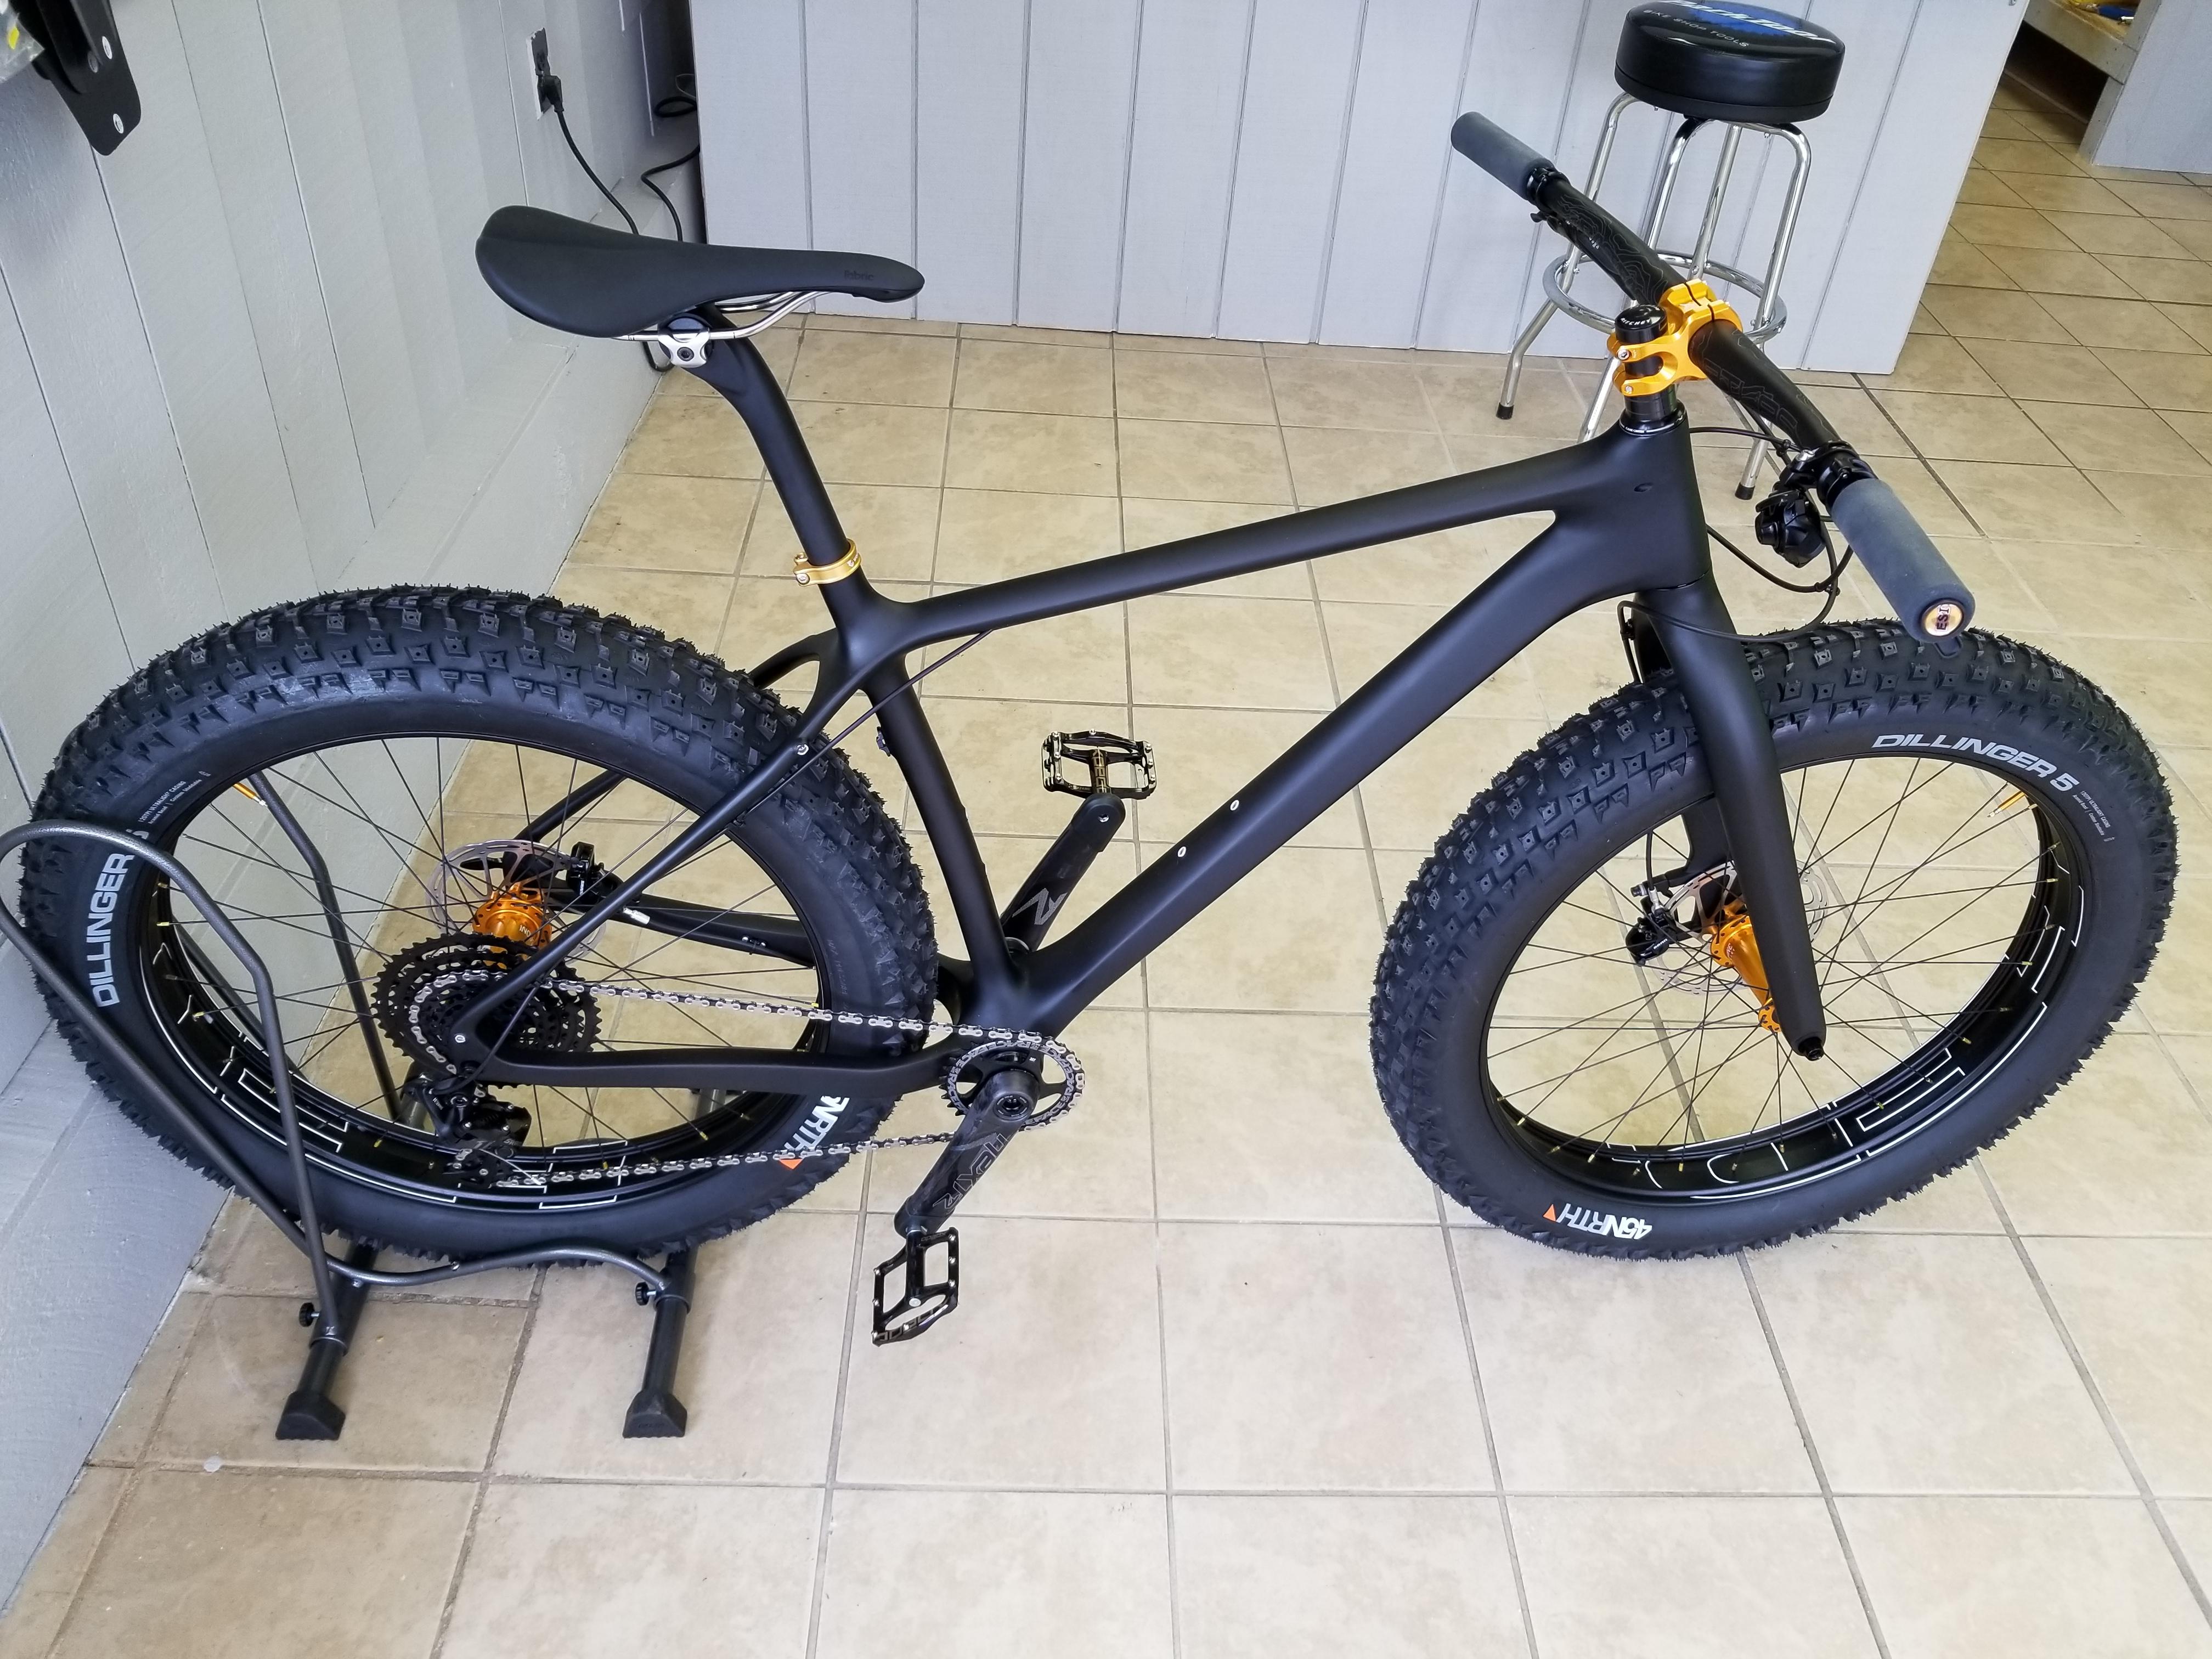 KB Wheels fat build